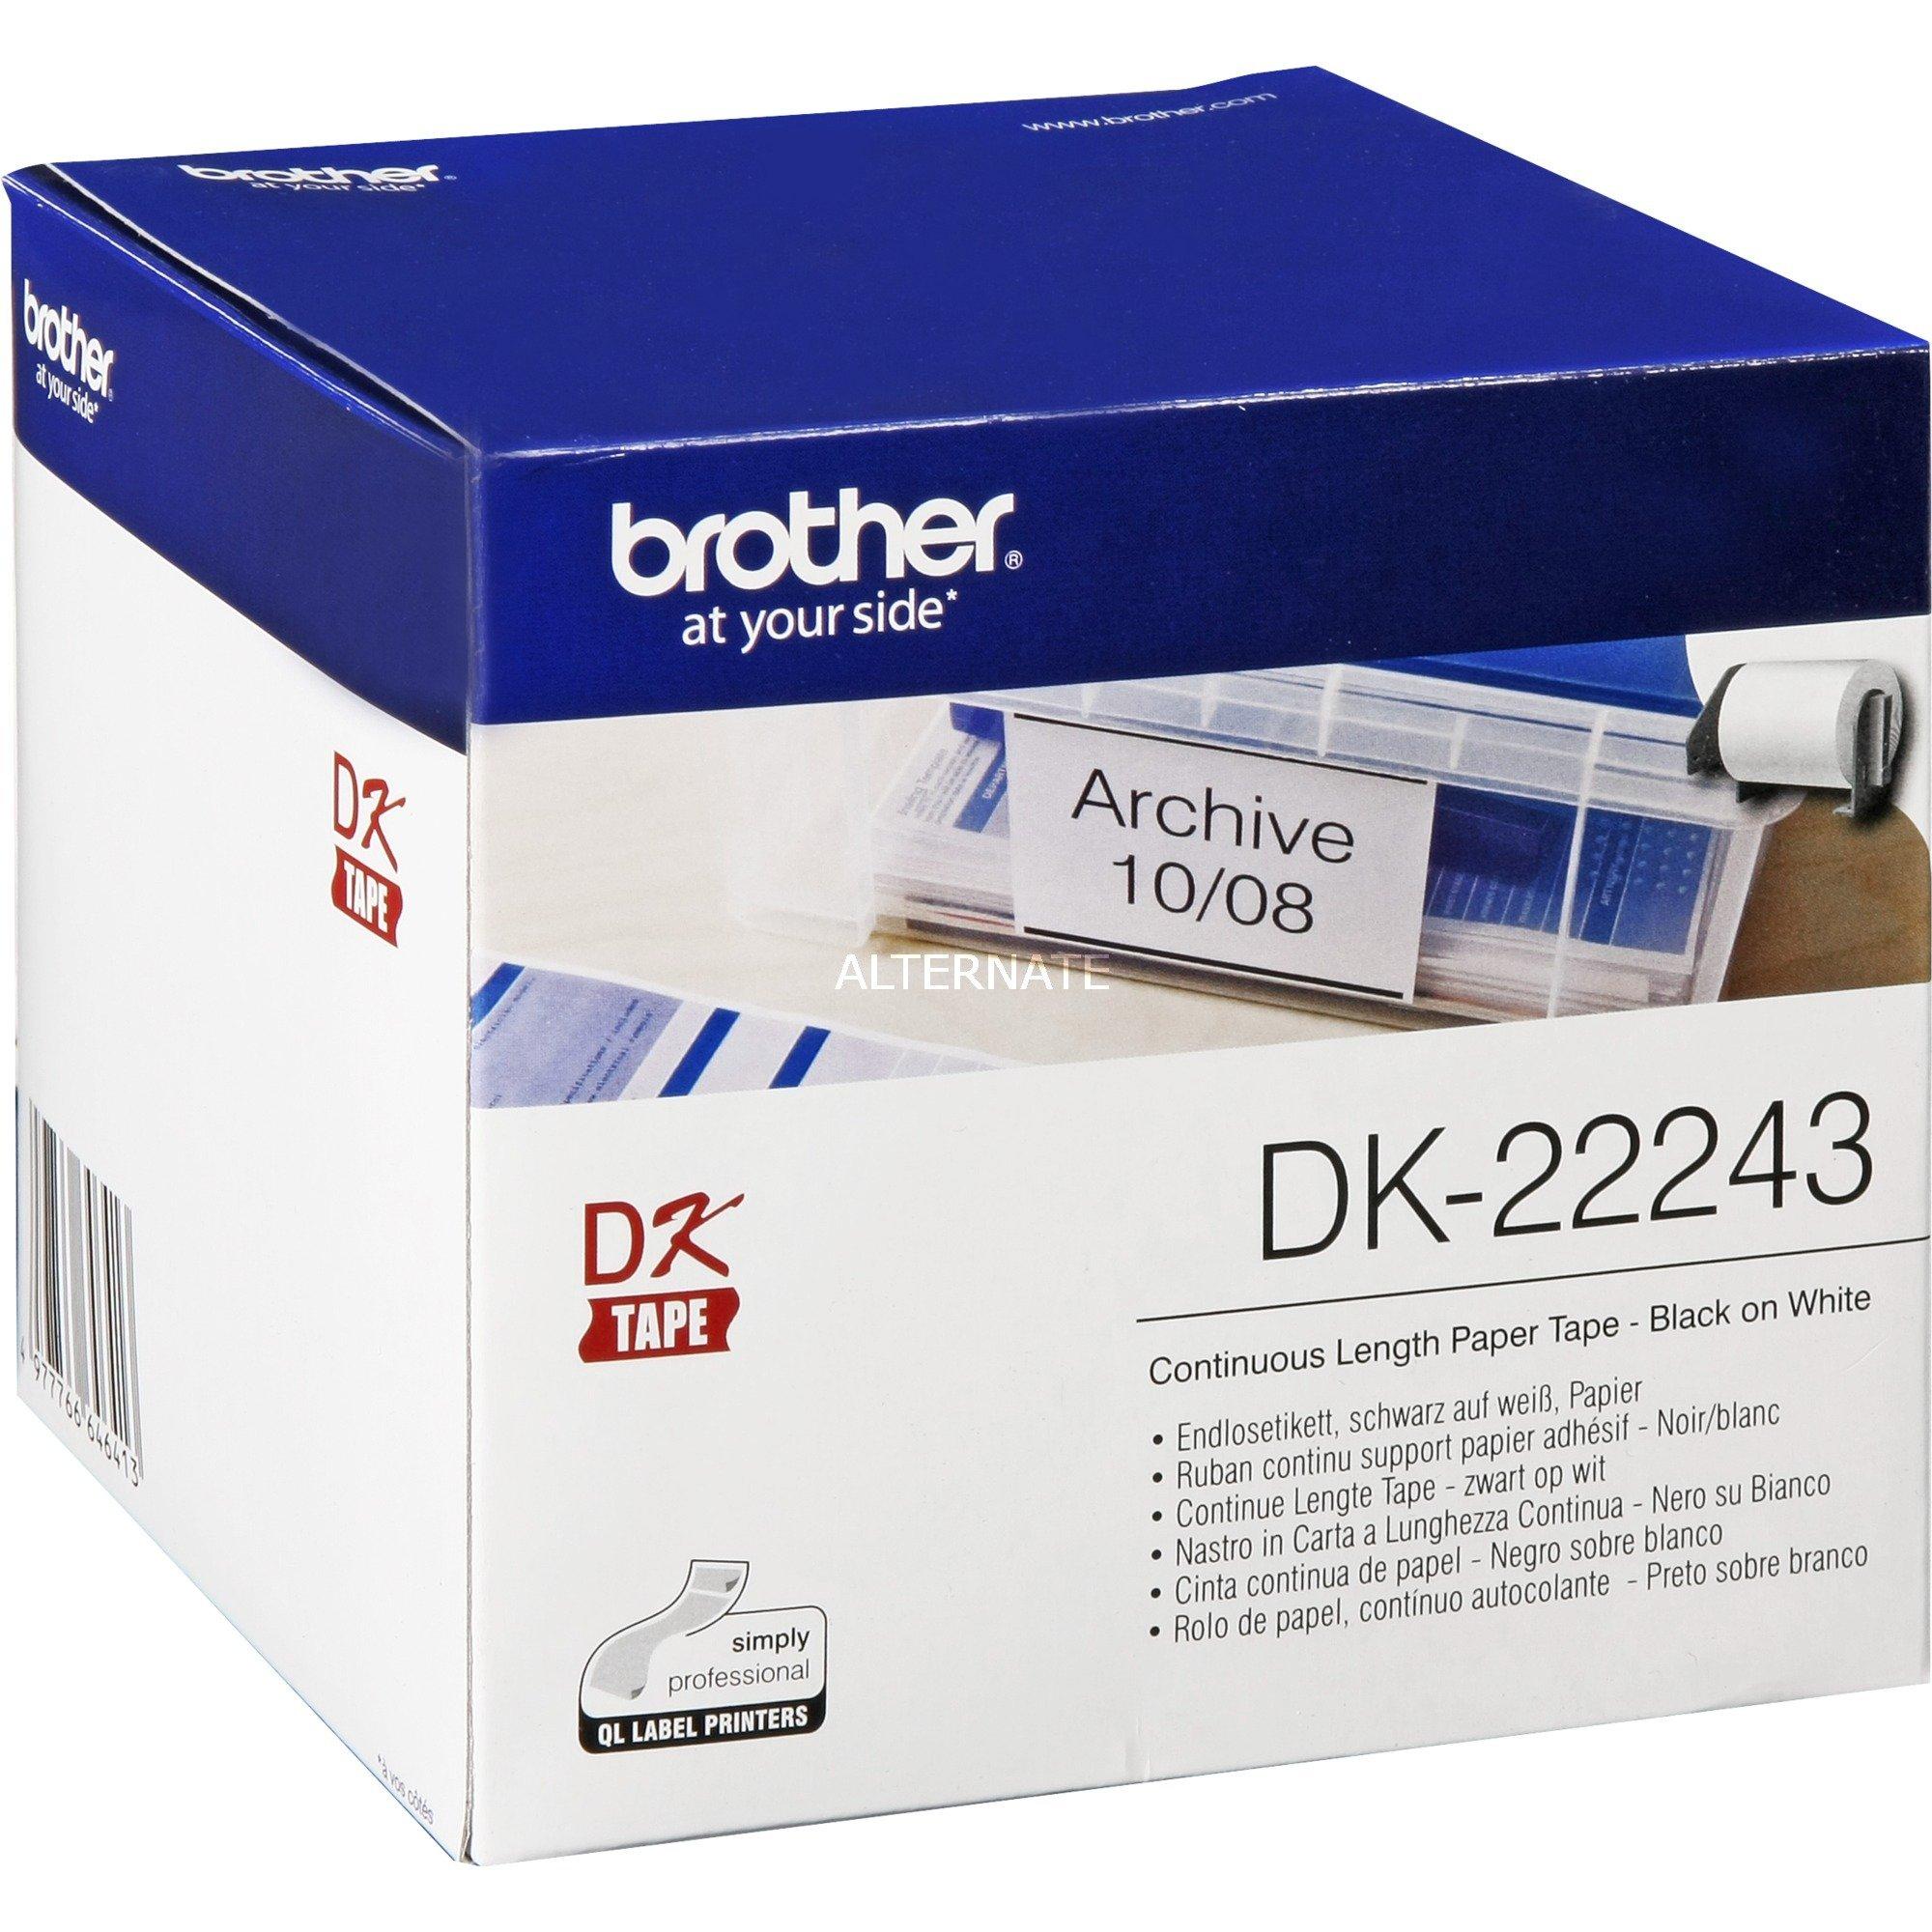 DK-22243 cinta para impresora de etiquetas, Cinta de escritura